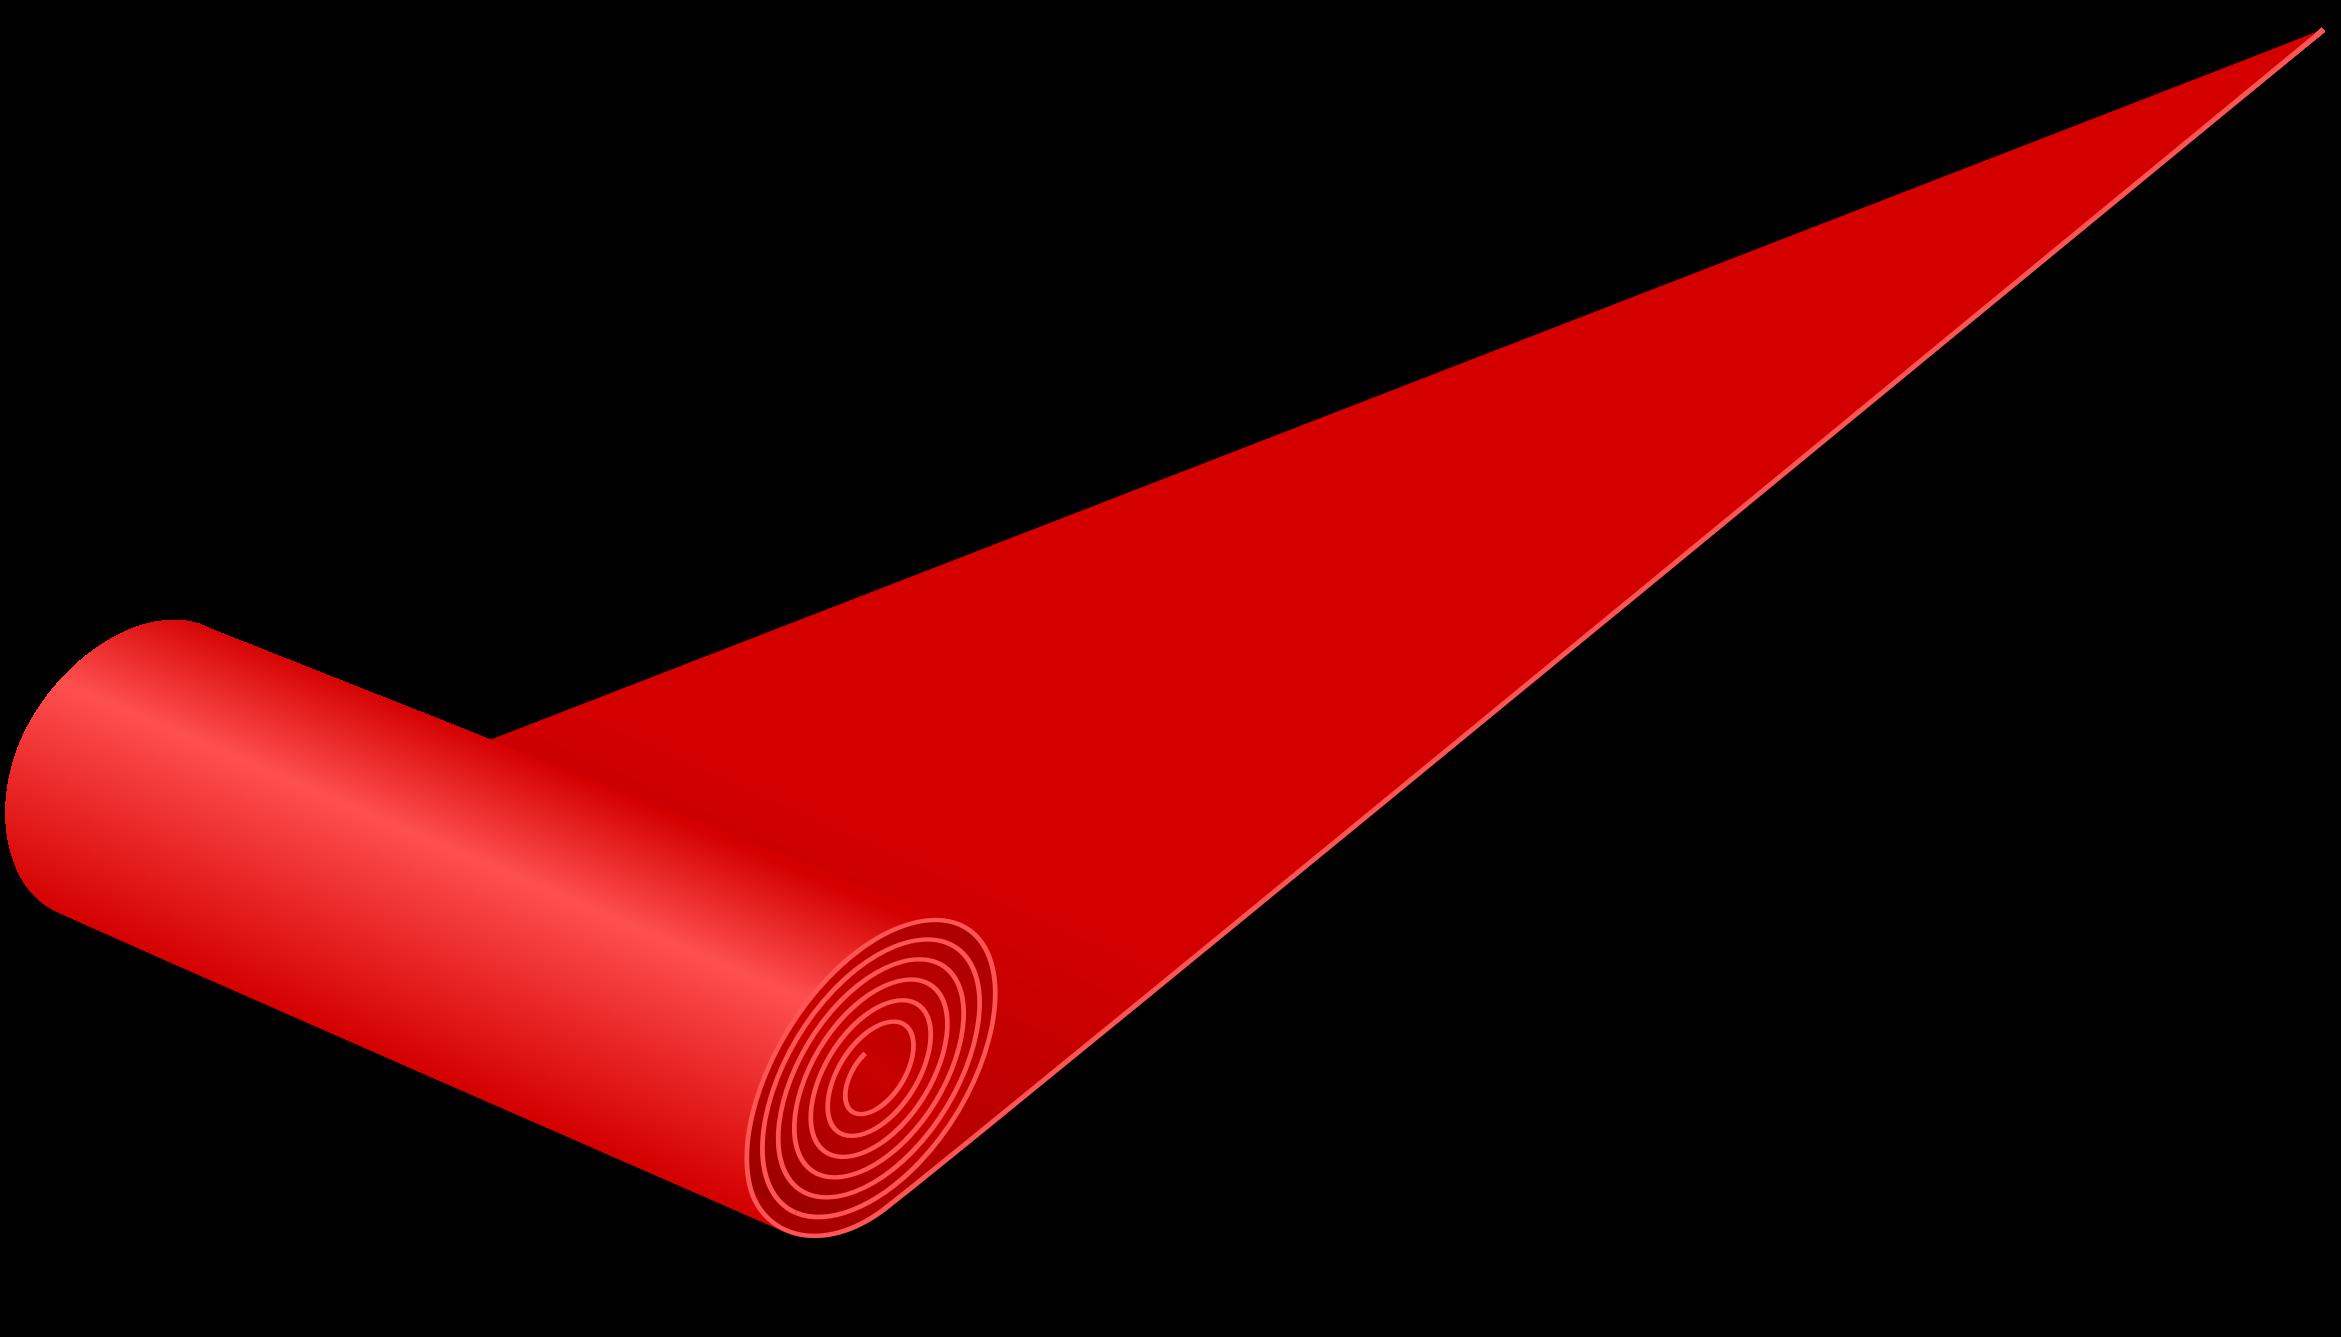 Clip Art Carpet Clipart carpet clipart kid red carpet